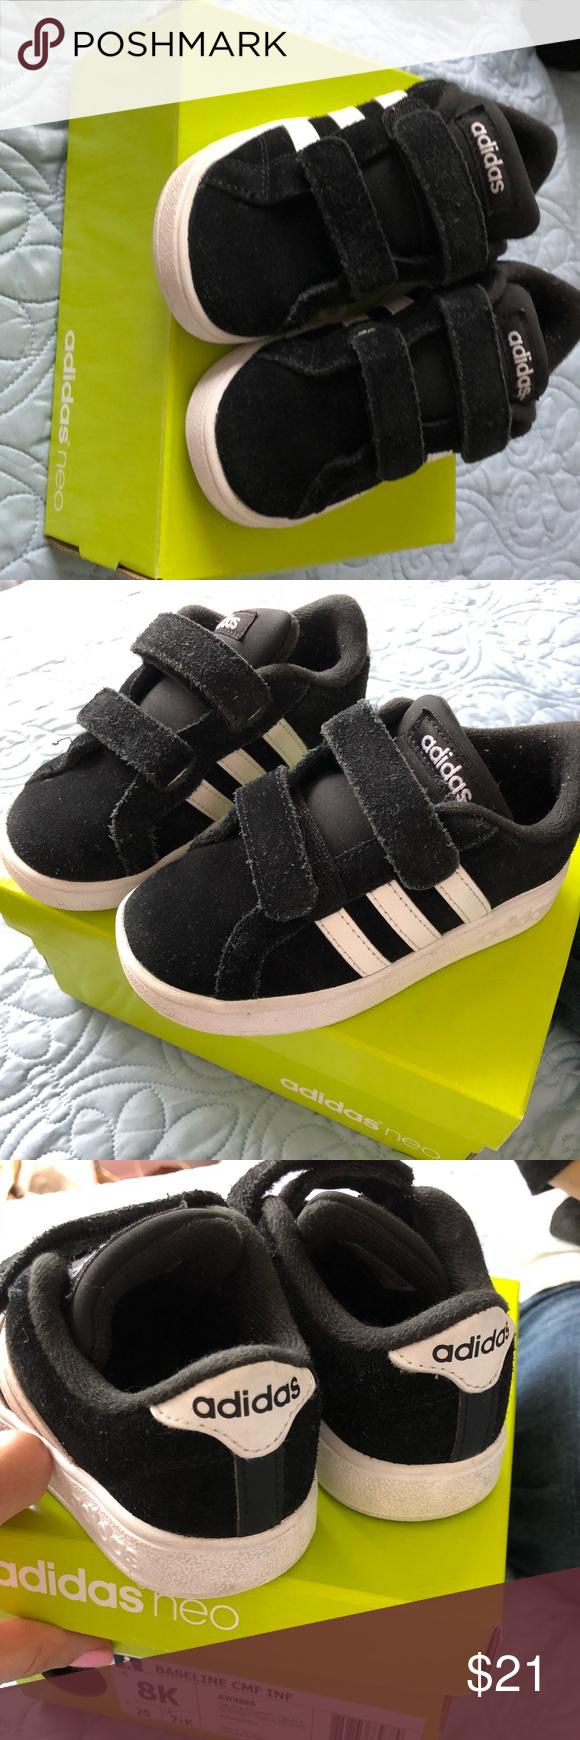 Adidas Neo Baseline AW4886 Black Suede